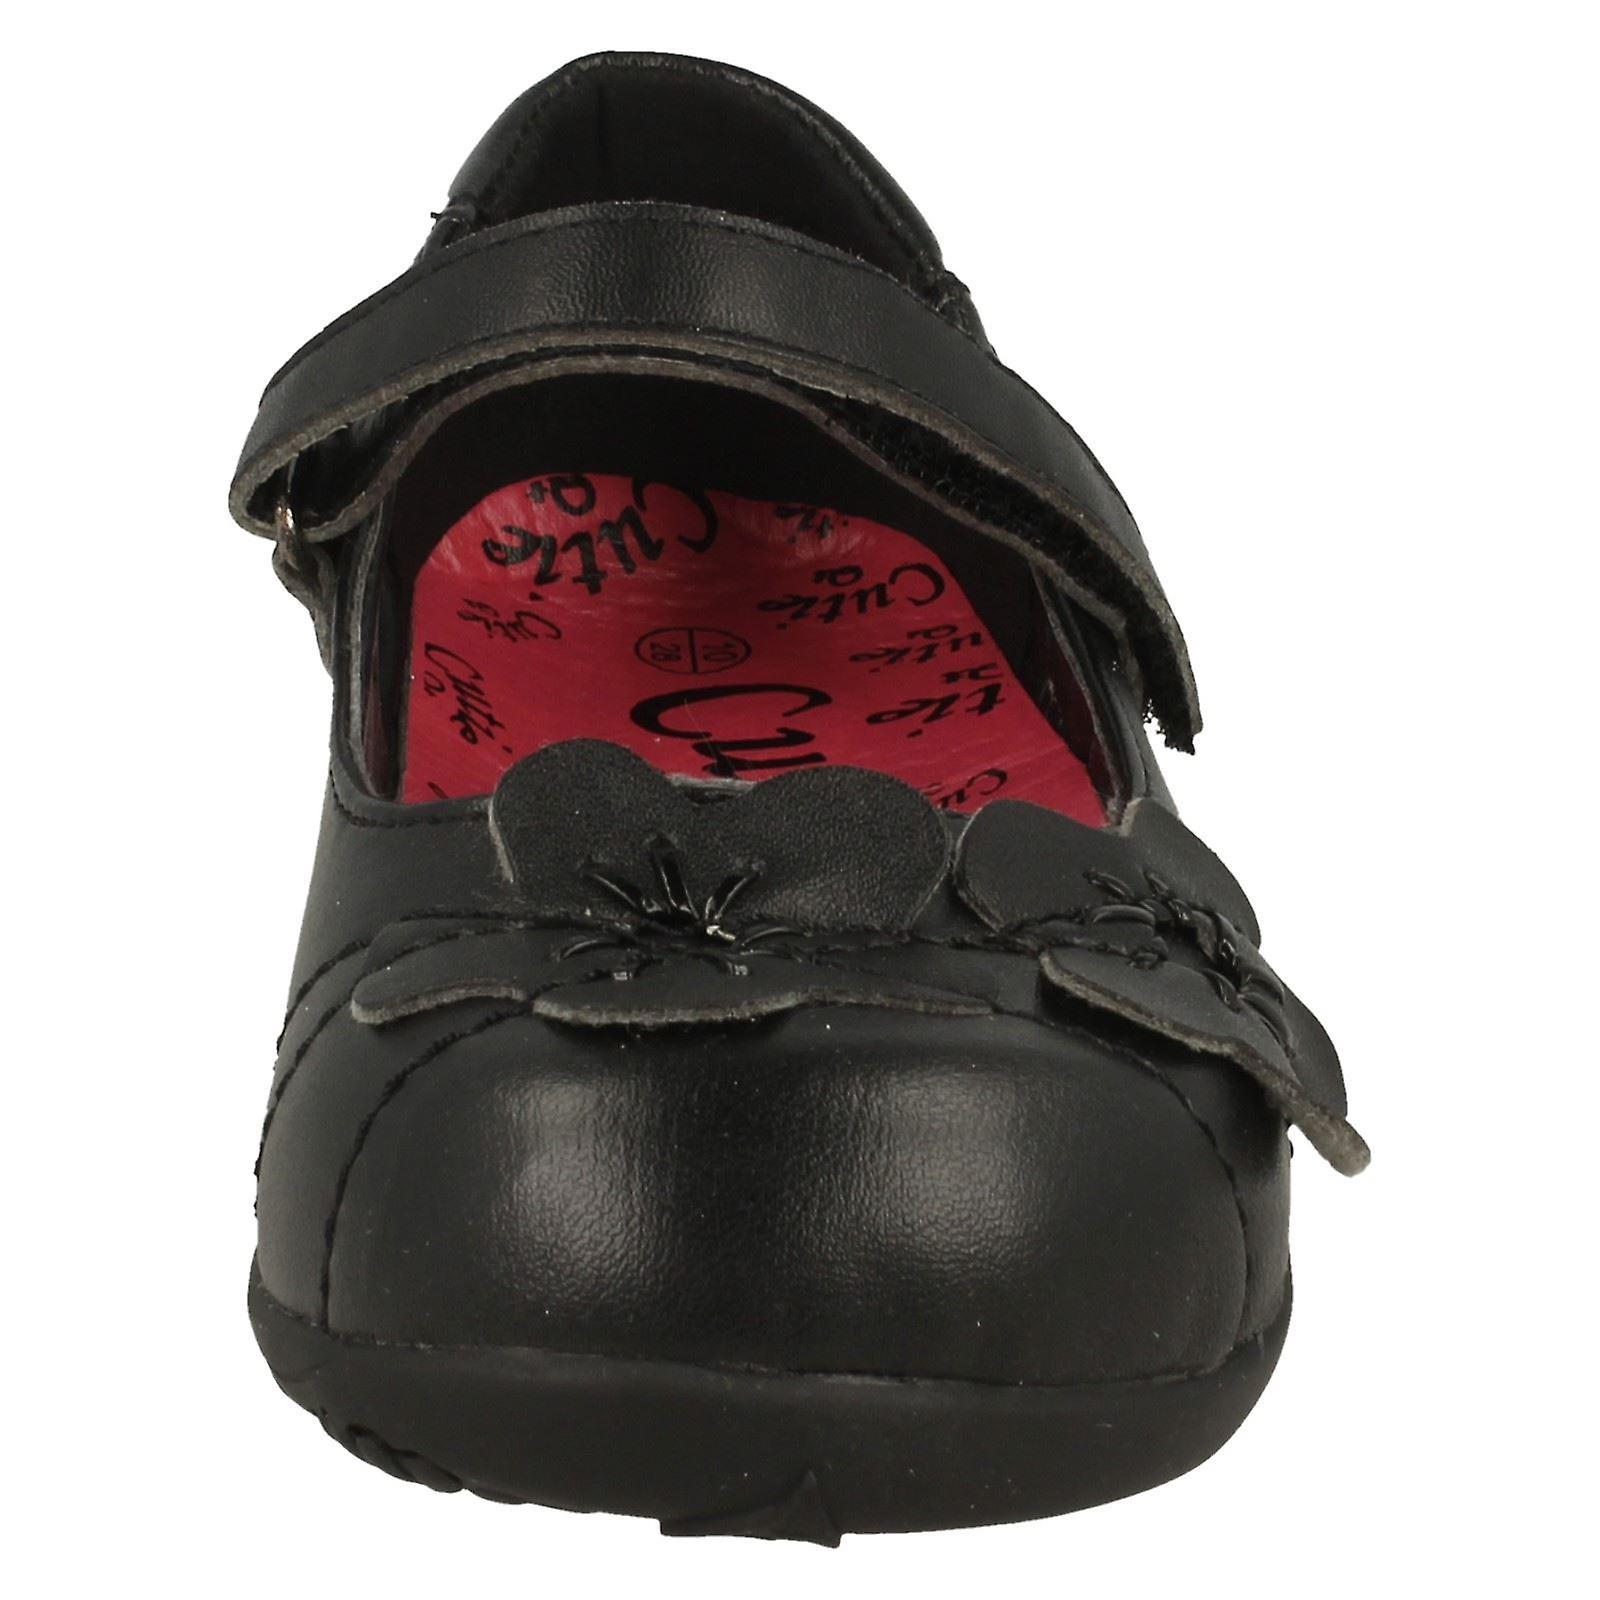 Girls Cutie Flat Shoe With Flower Trim